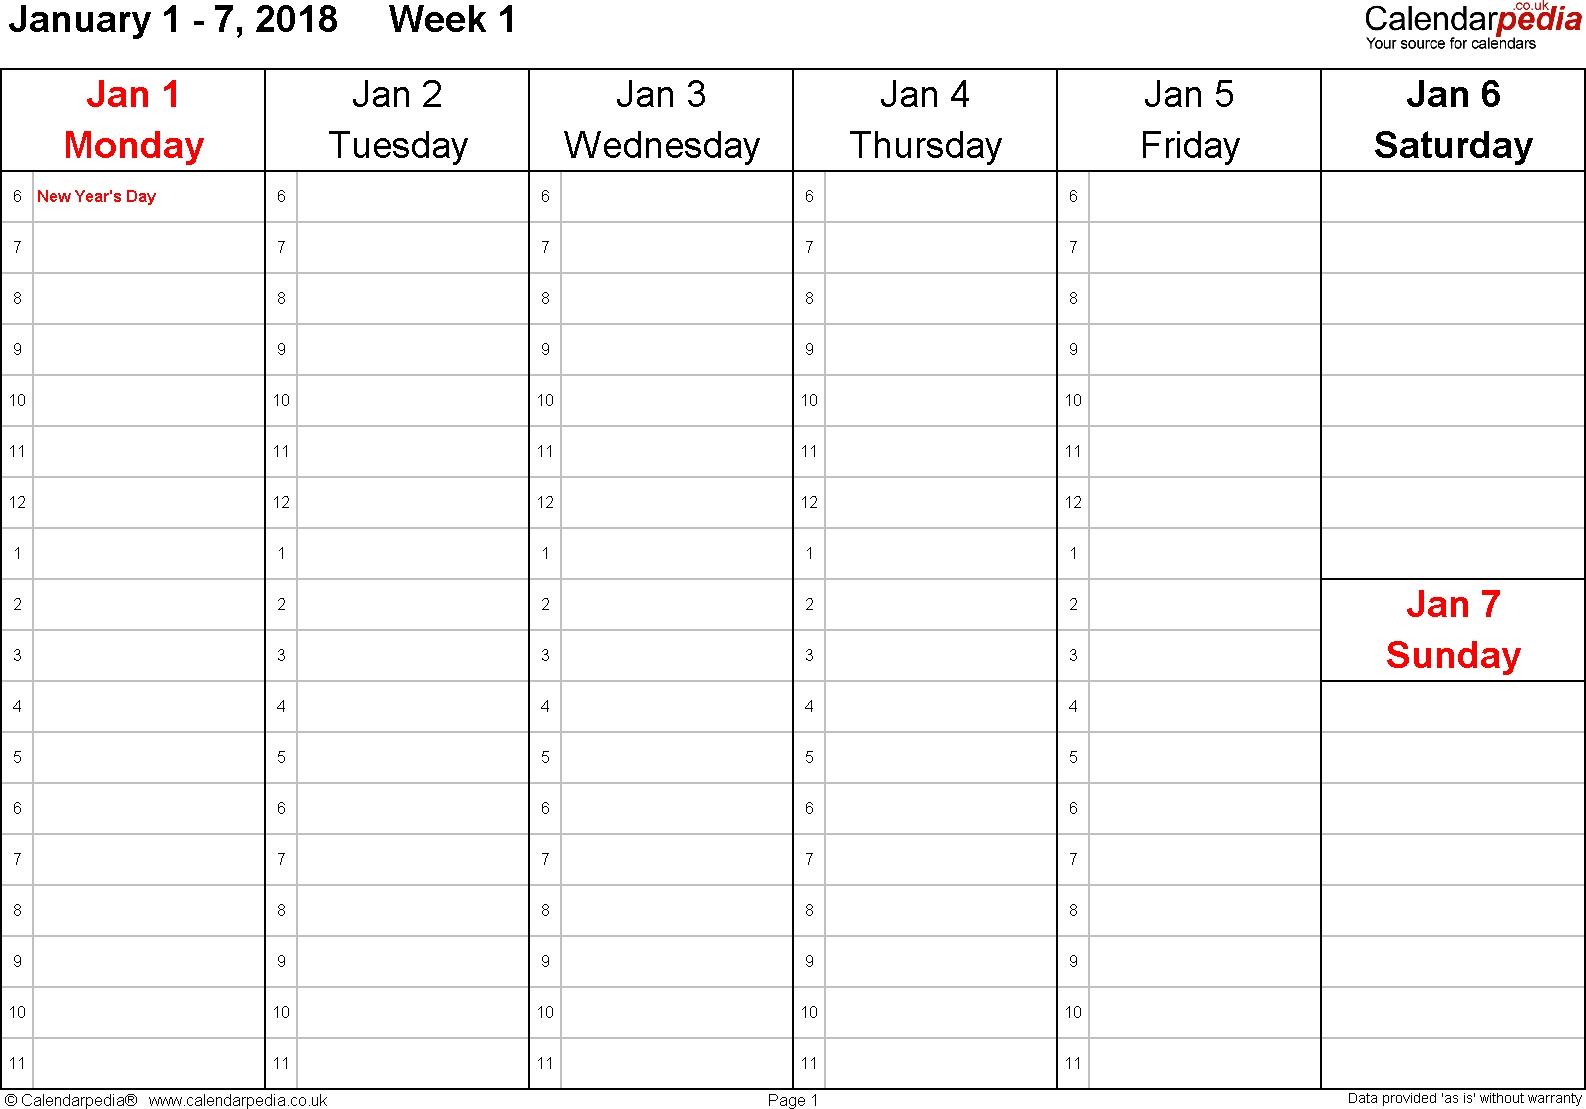 Weekly Calendar 2018 Uk - Free Printable Templates For Pdf